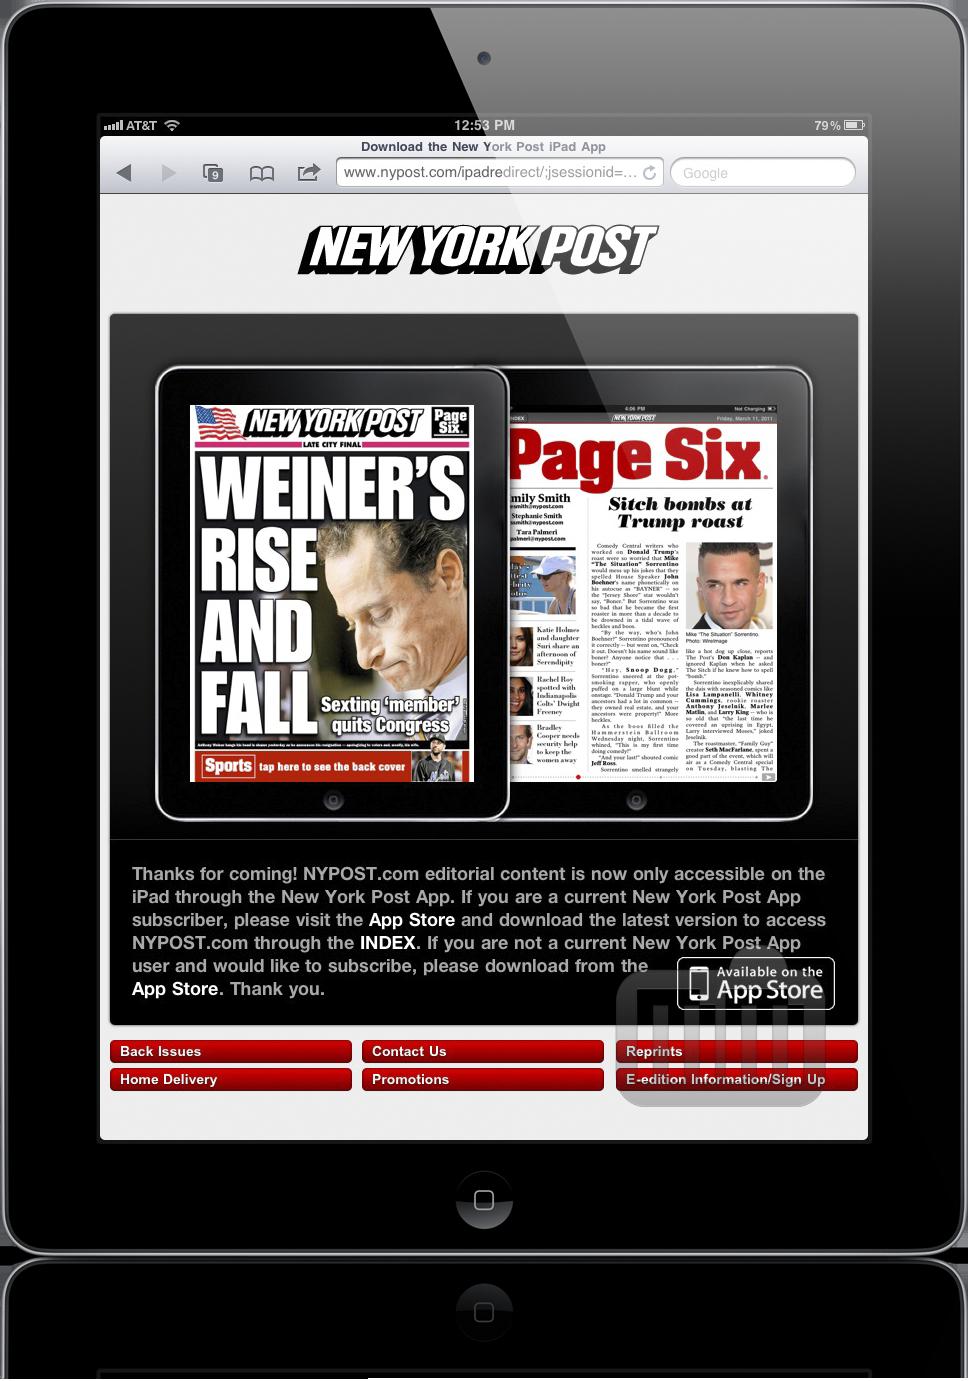 New York Post bloqueado em iPads